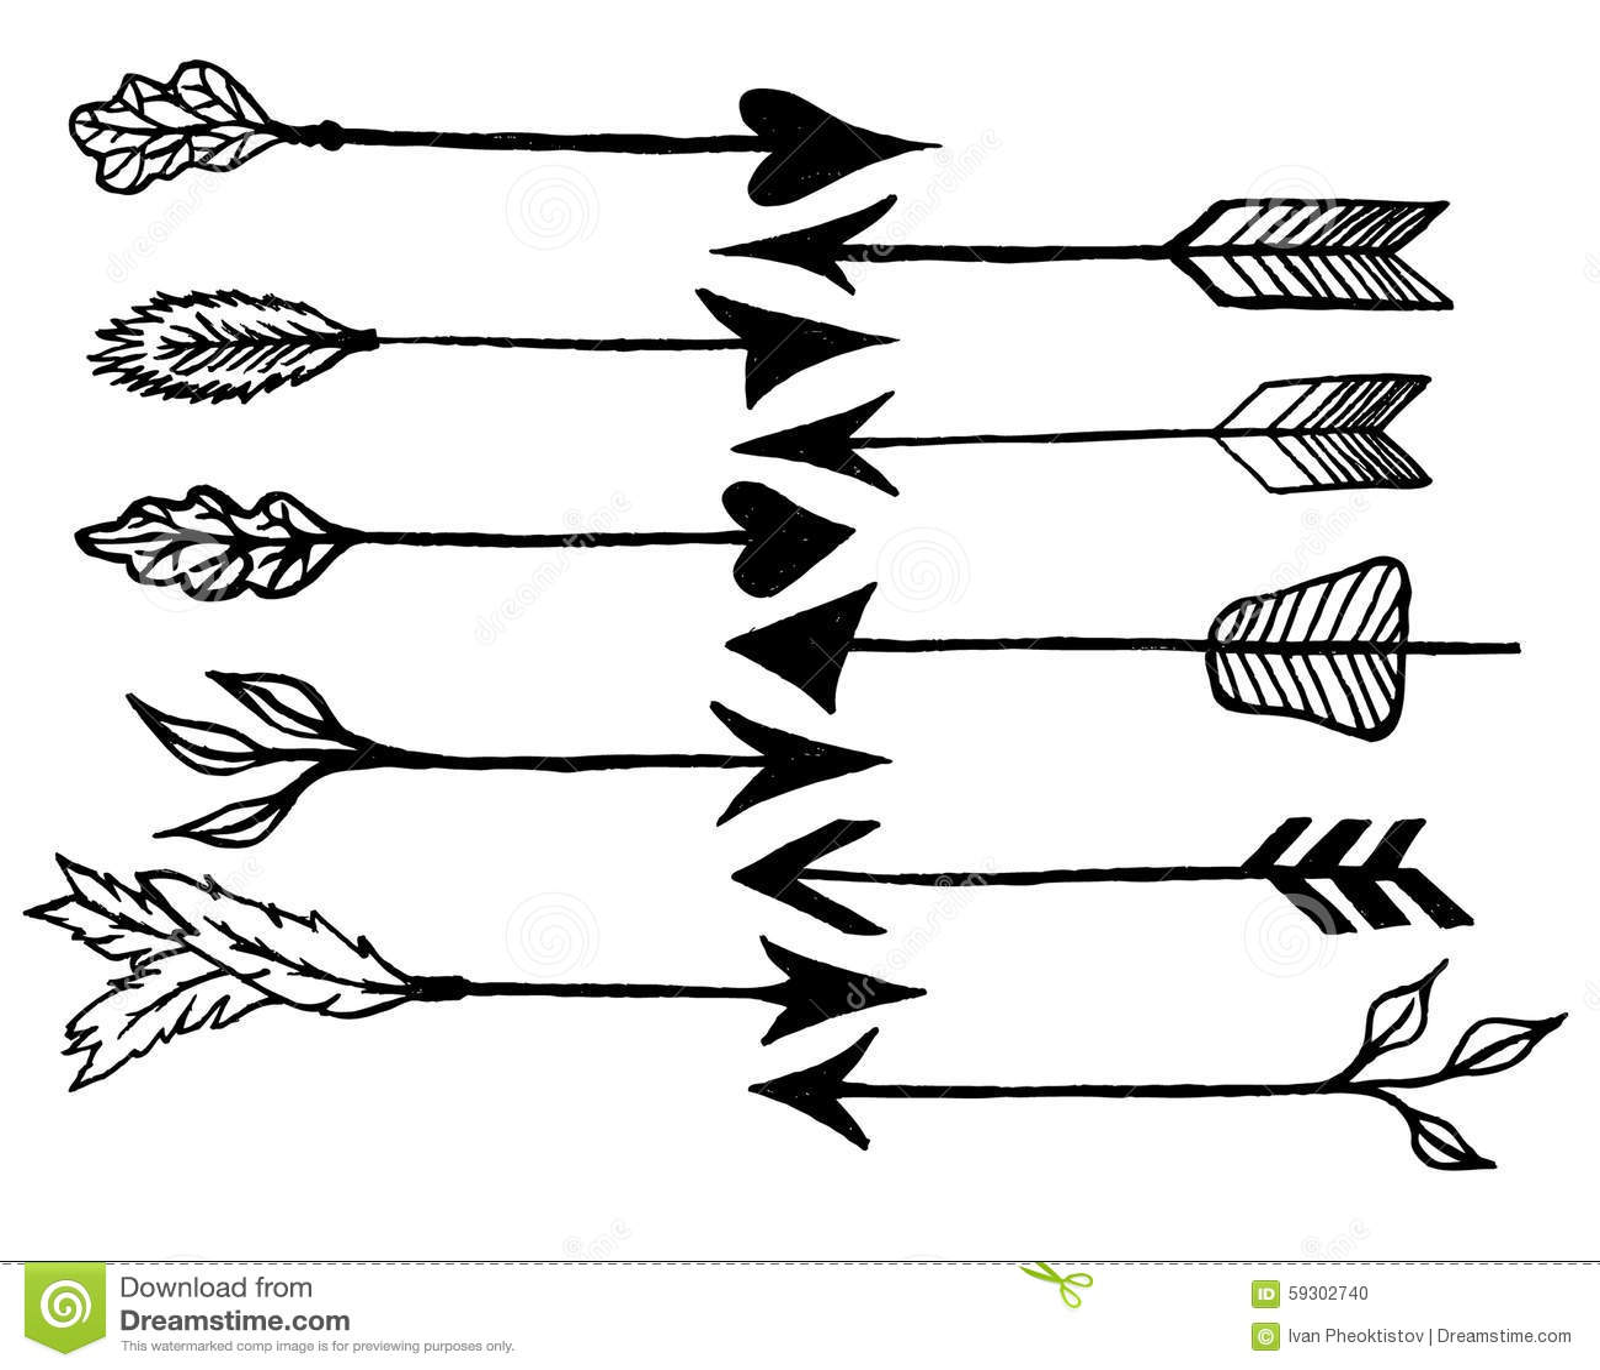 Rustic Arrows Stock Vector Illustration Of Element